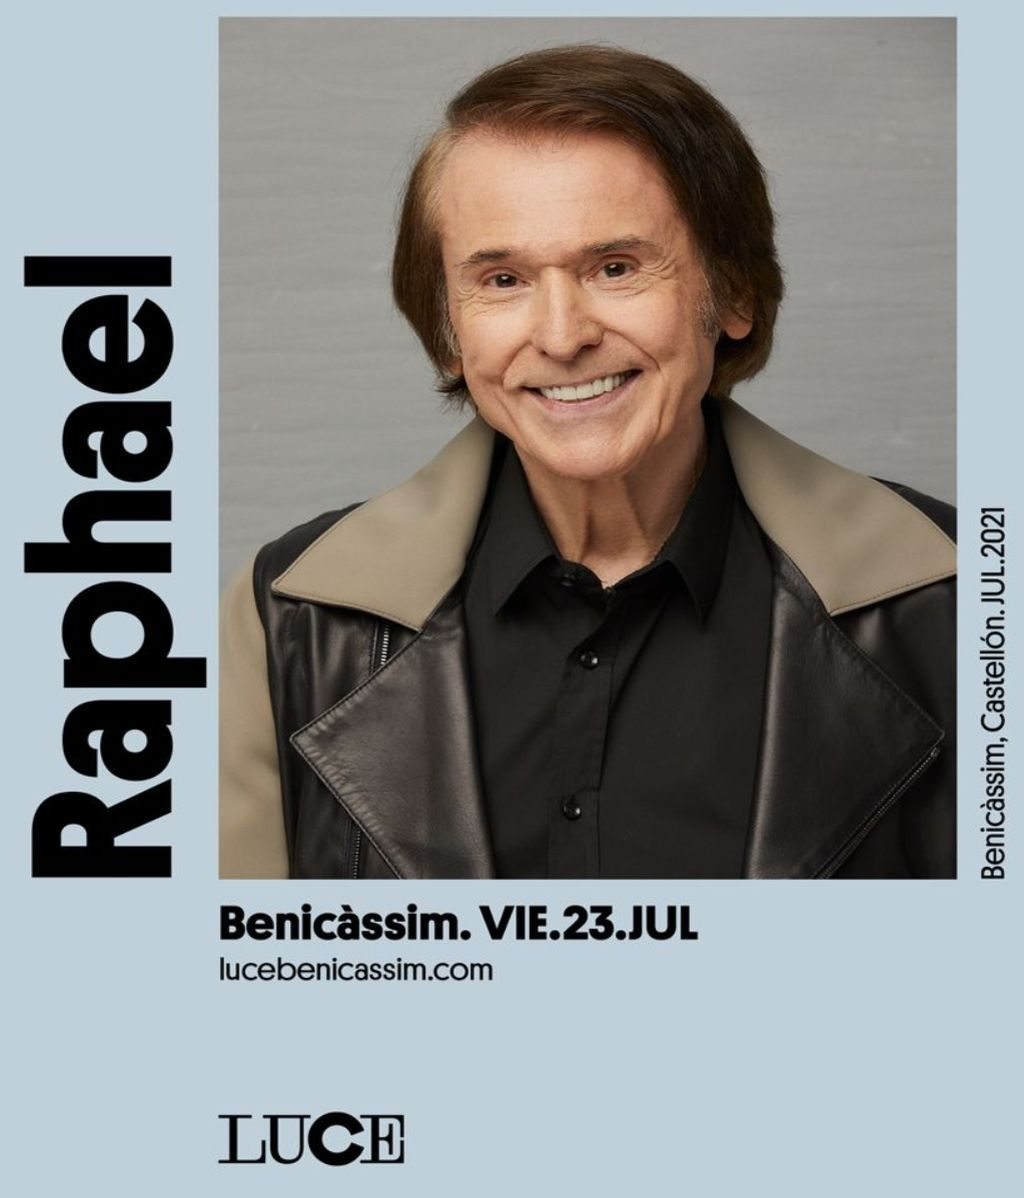 RAPHAEL LUCE BENICASSIMv